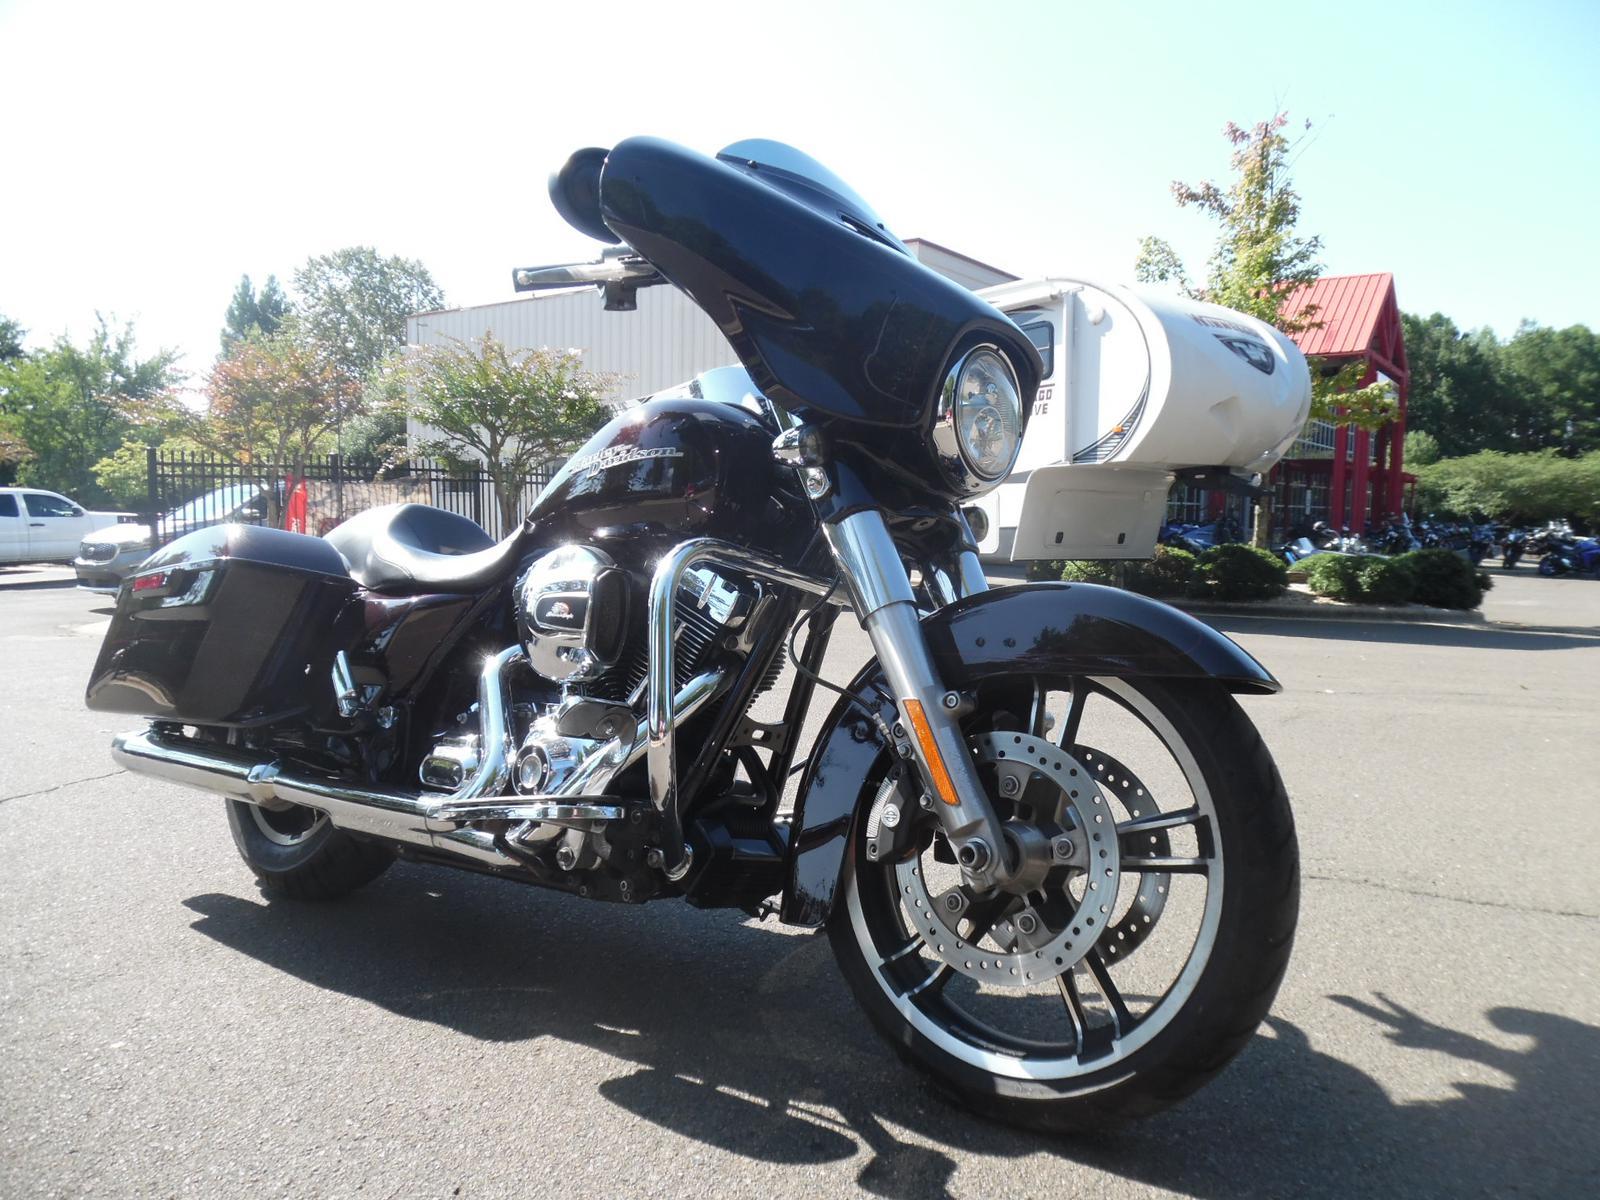 Street Glide For Sale >> 2014 Harley Davidson Street Glide Special